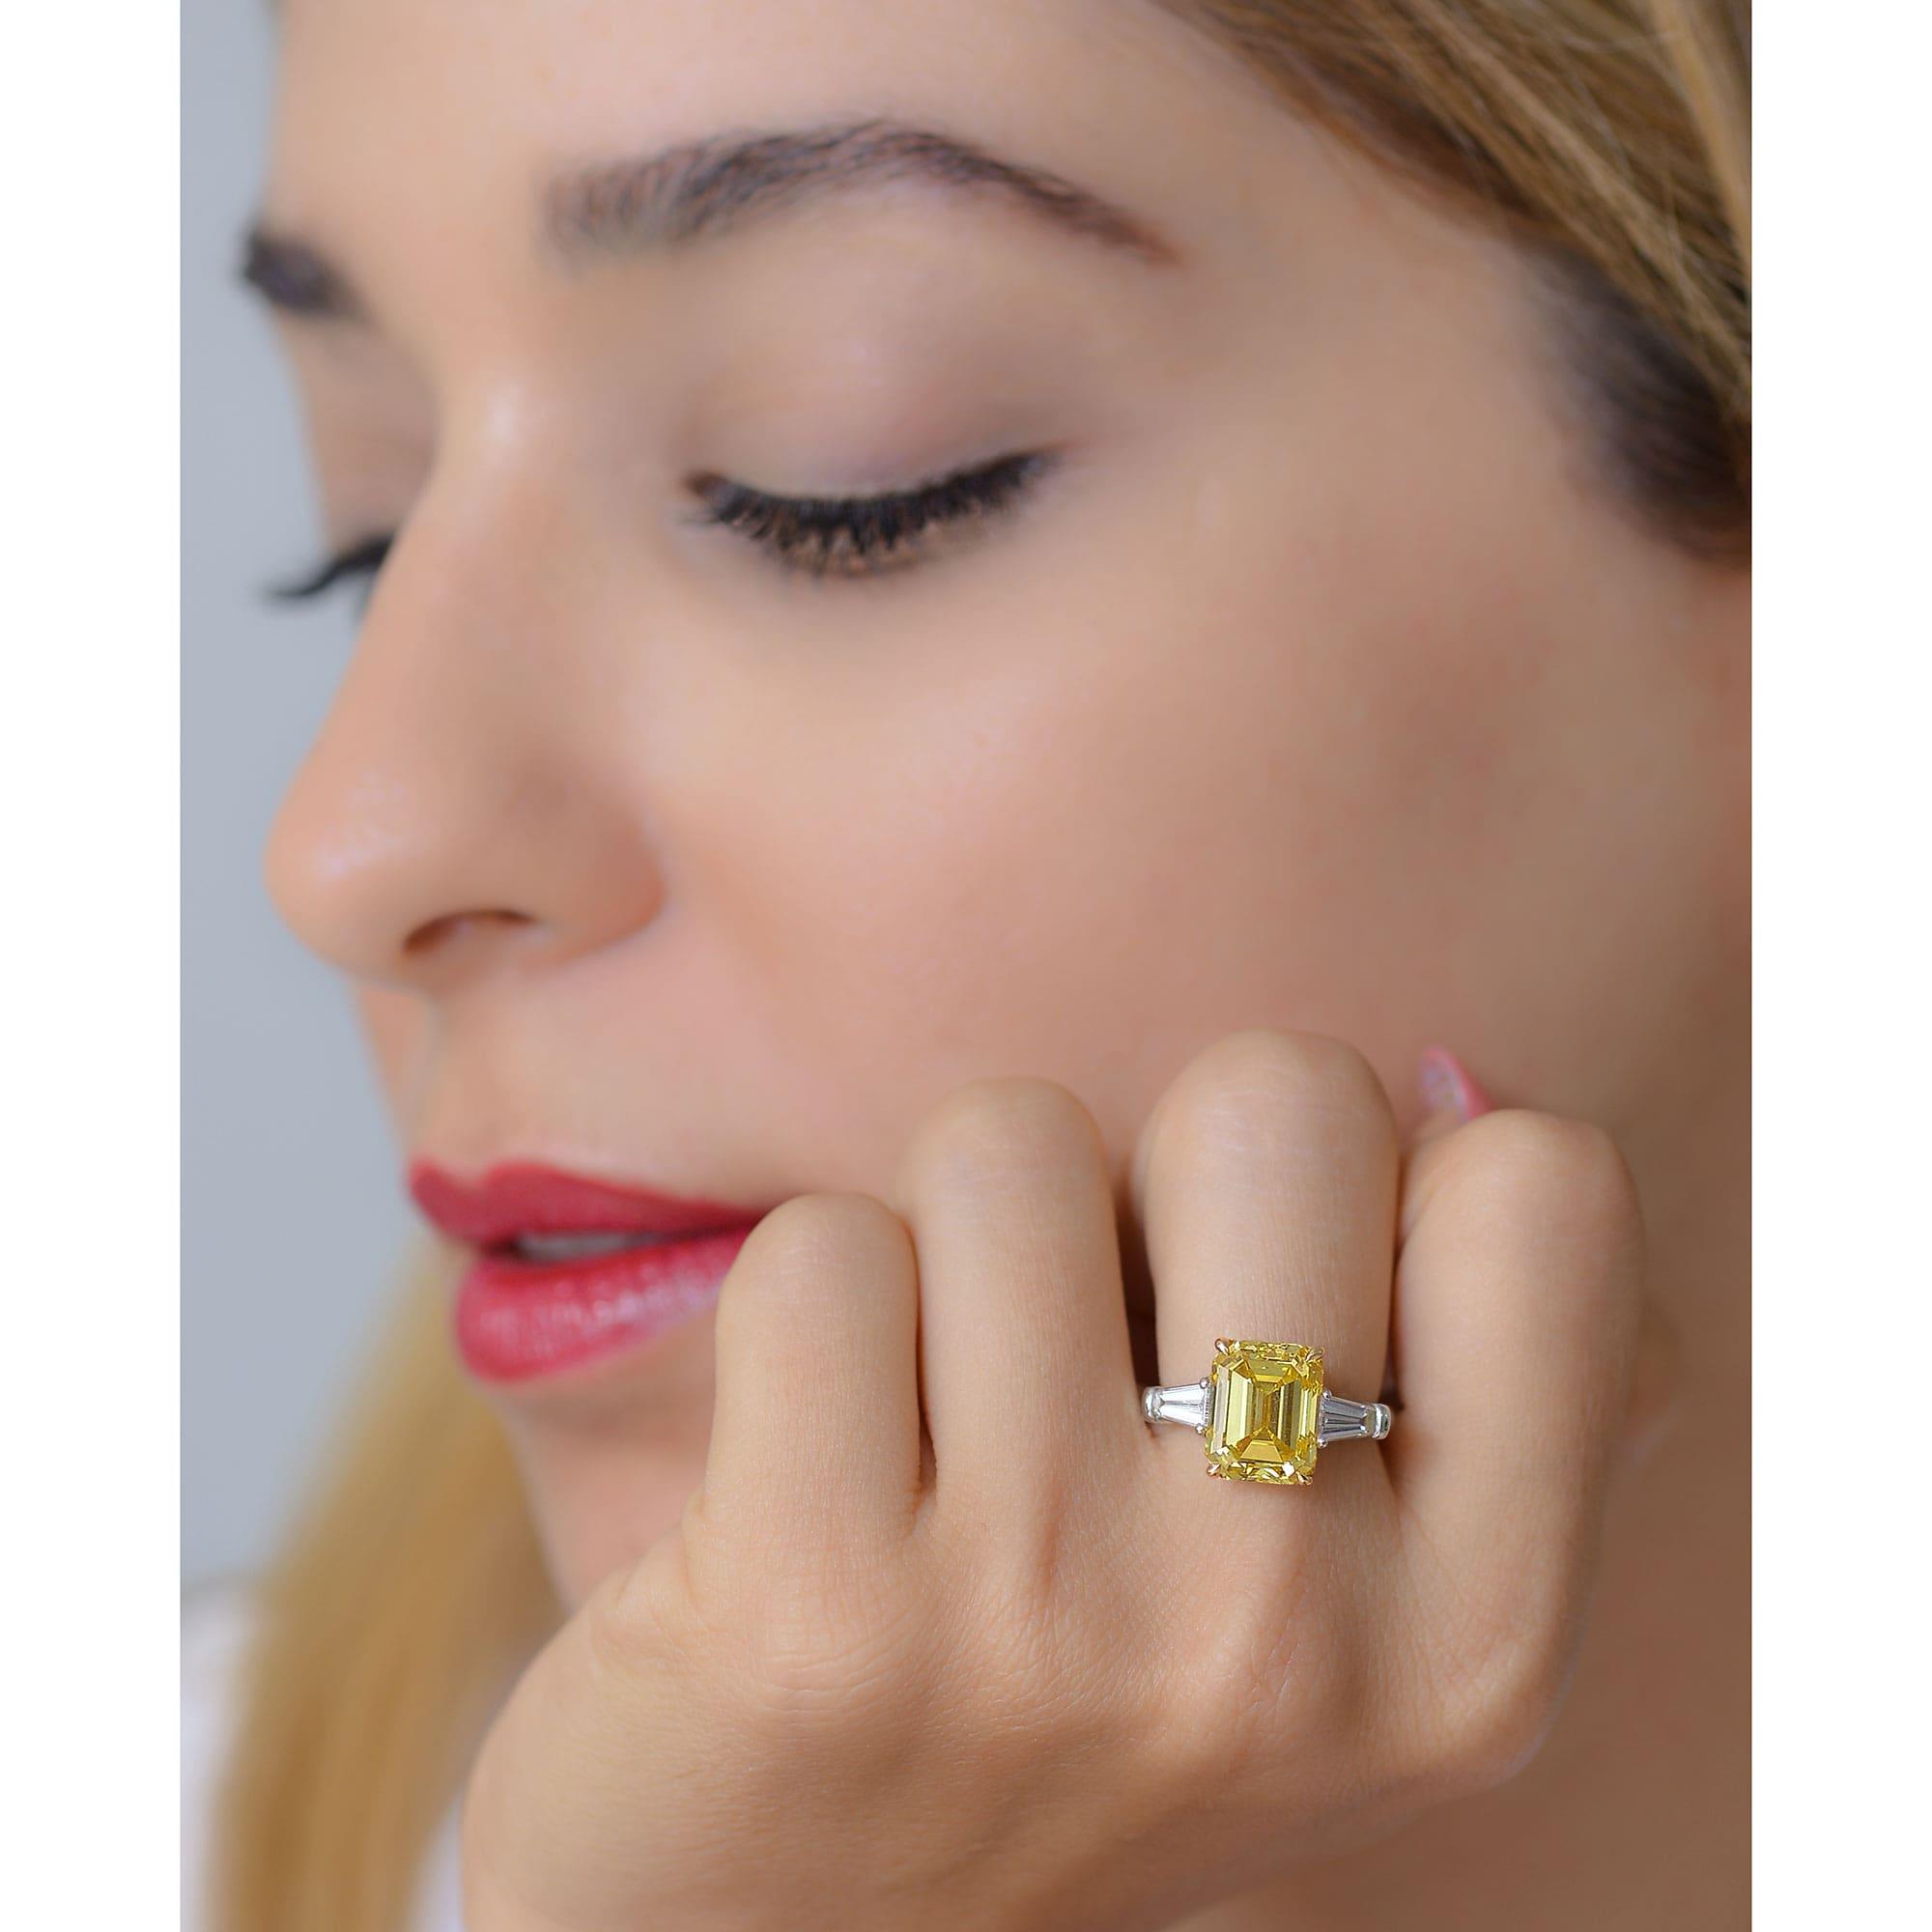 The LEIBISH 5.91 ct Fancy Vivid Yellow Emerald cut diamond ring